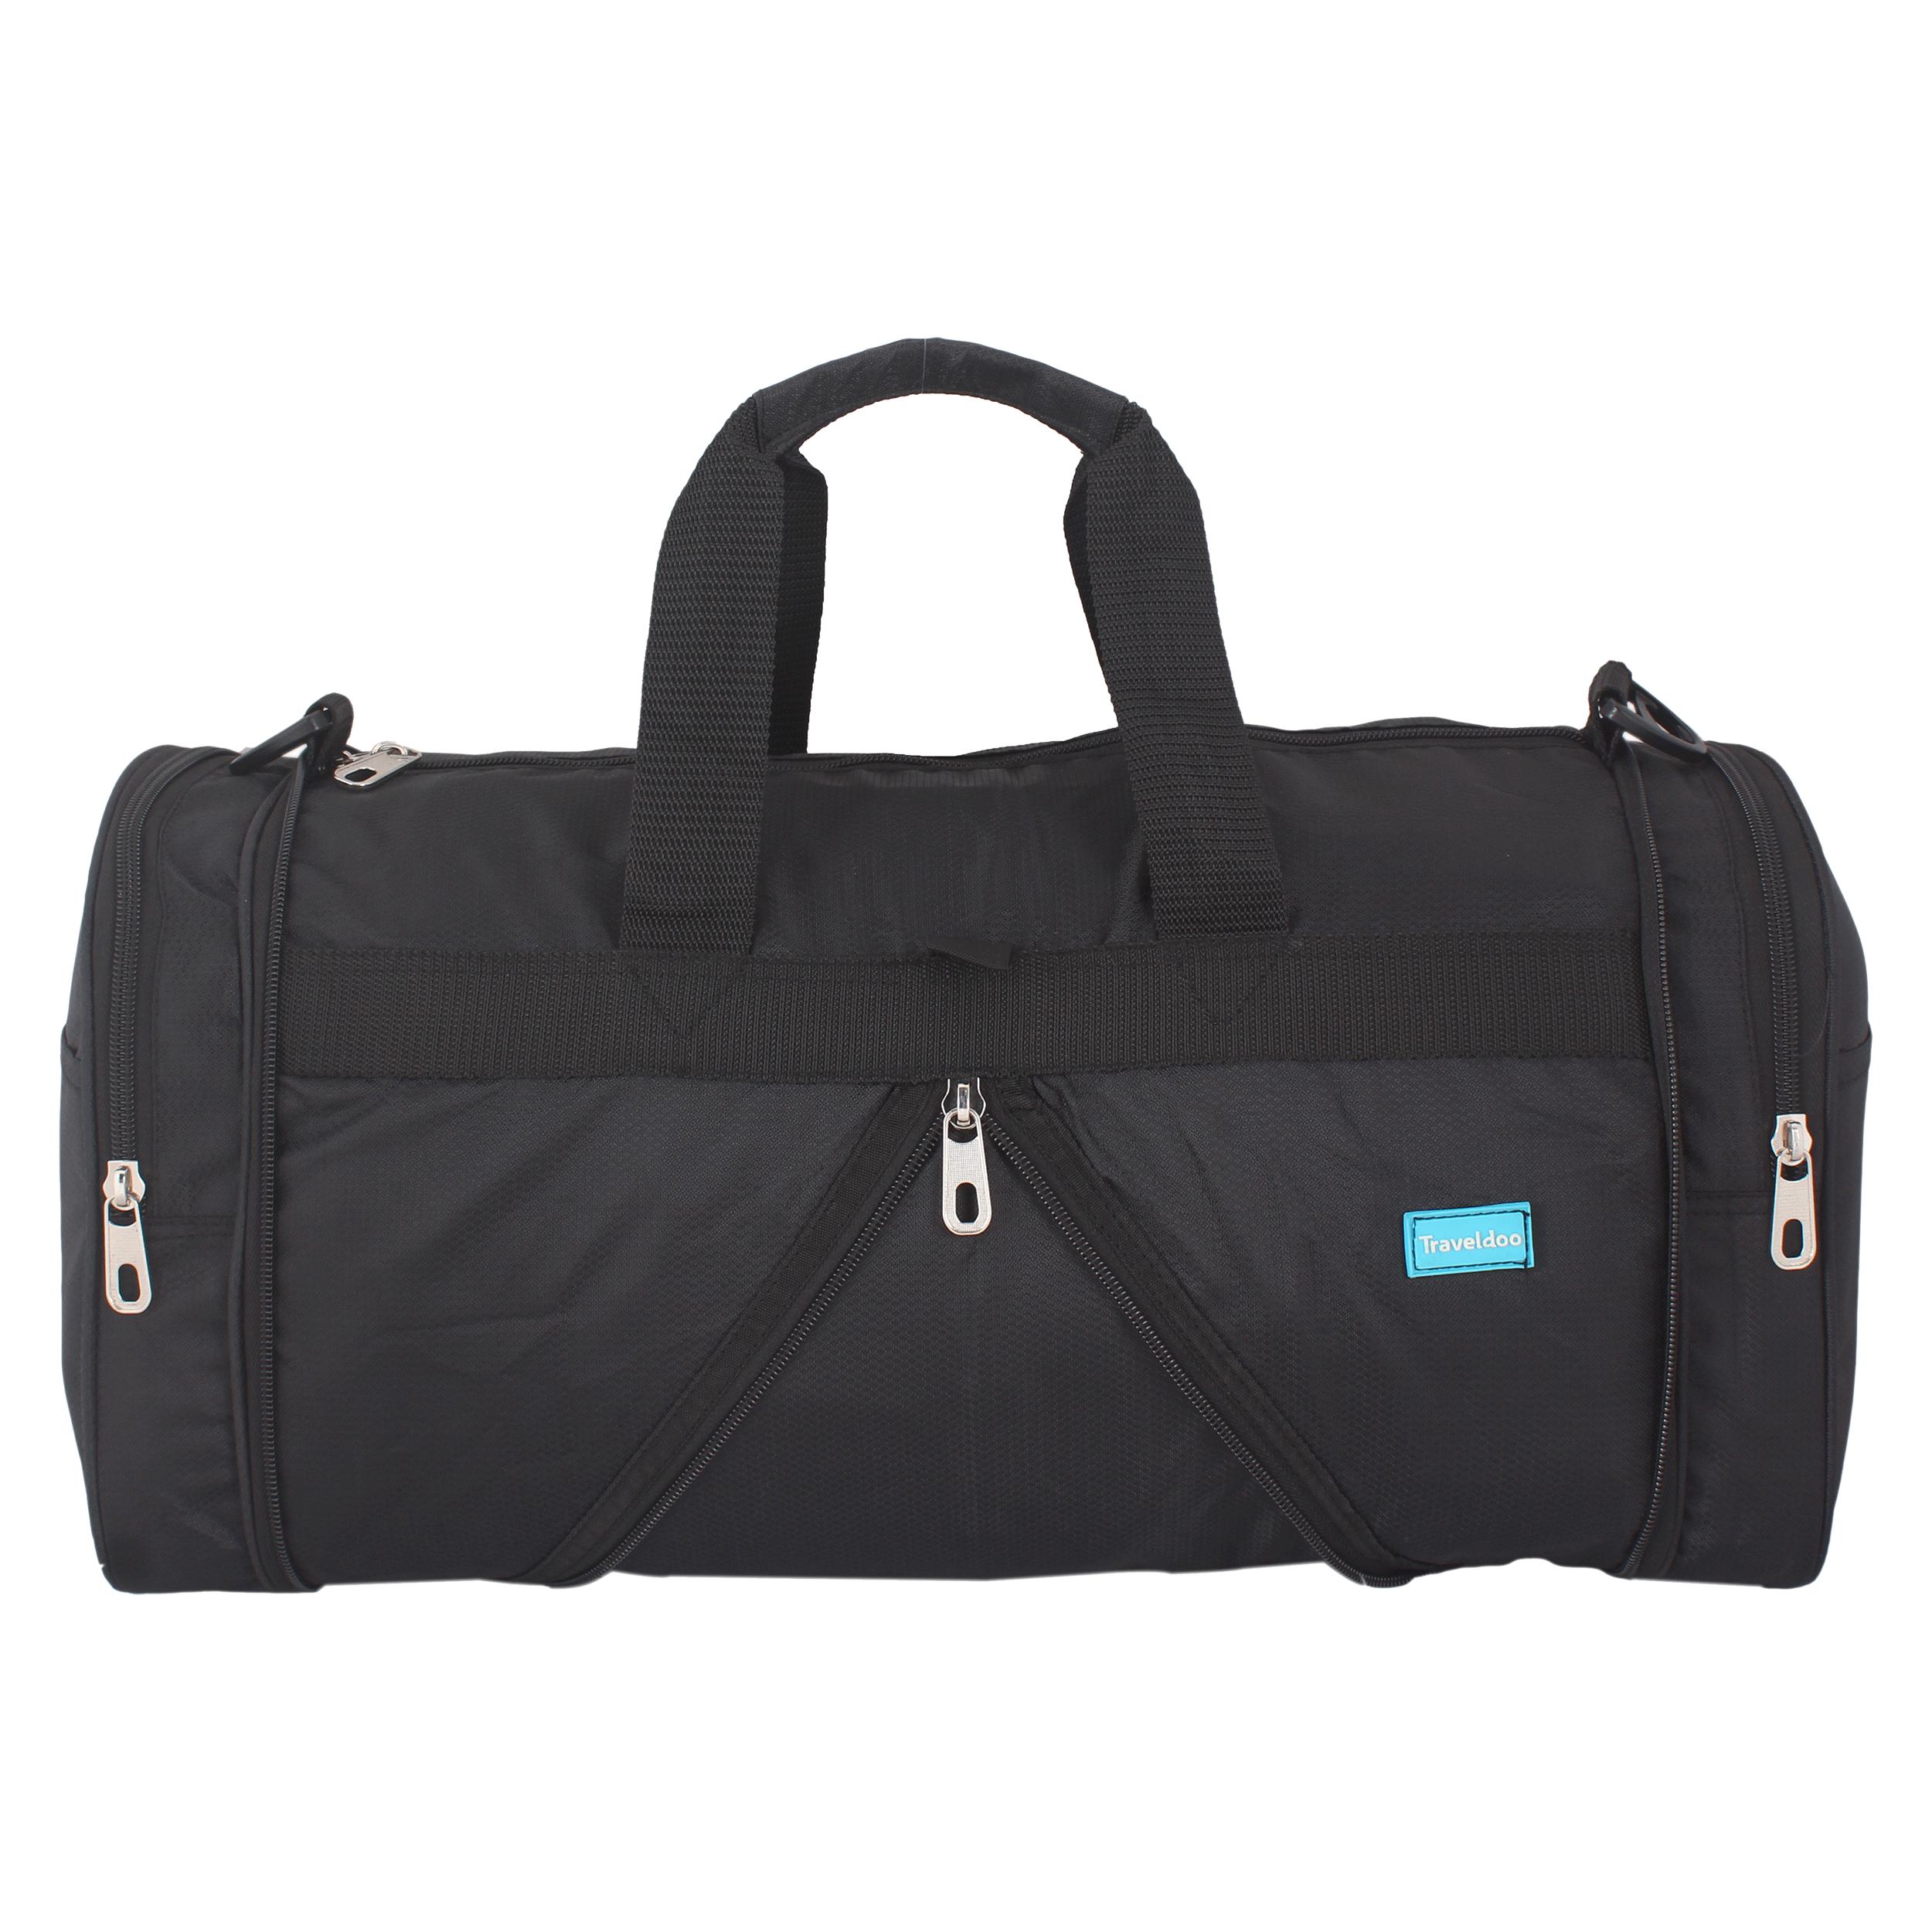 Traveldoo 28 inch Square Folding Duffle Bag (DBS03001, Black)_1